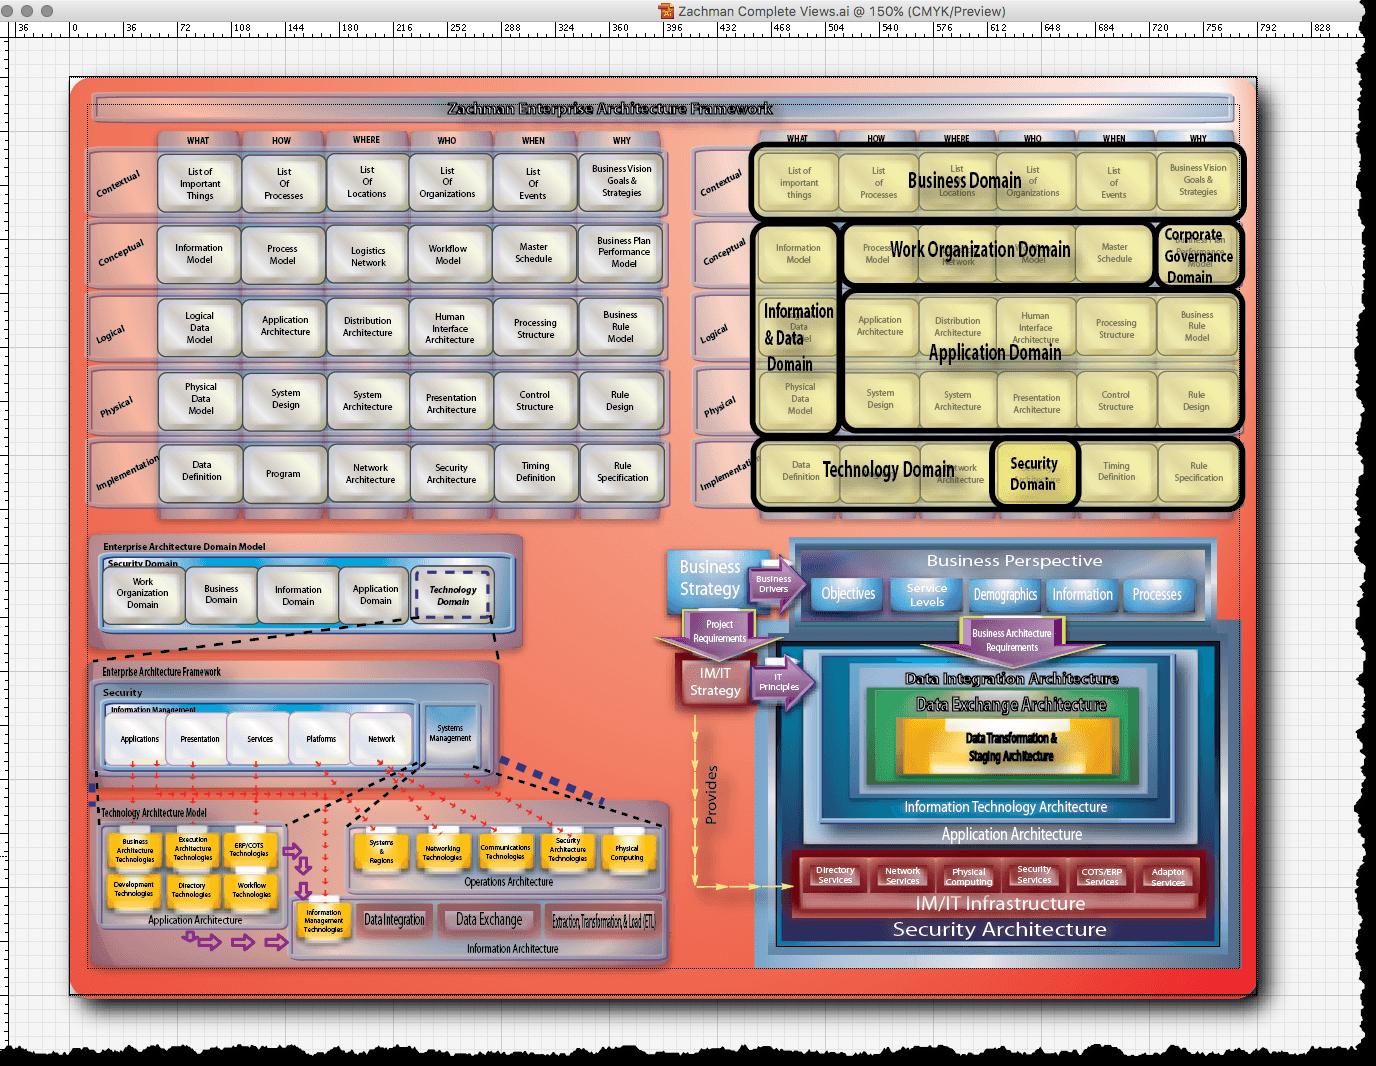 zachman framework template - generic zachman ea template think2xit